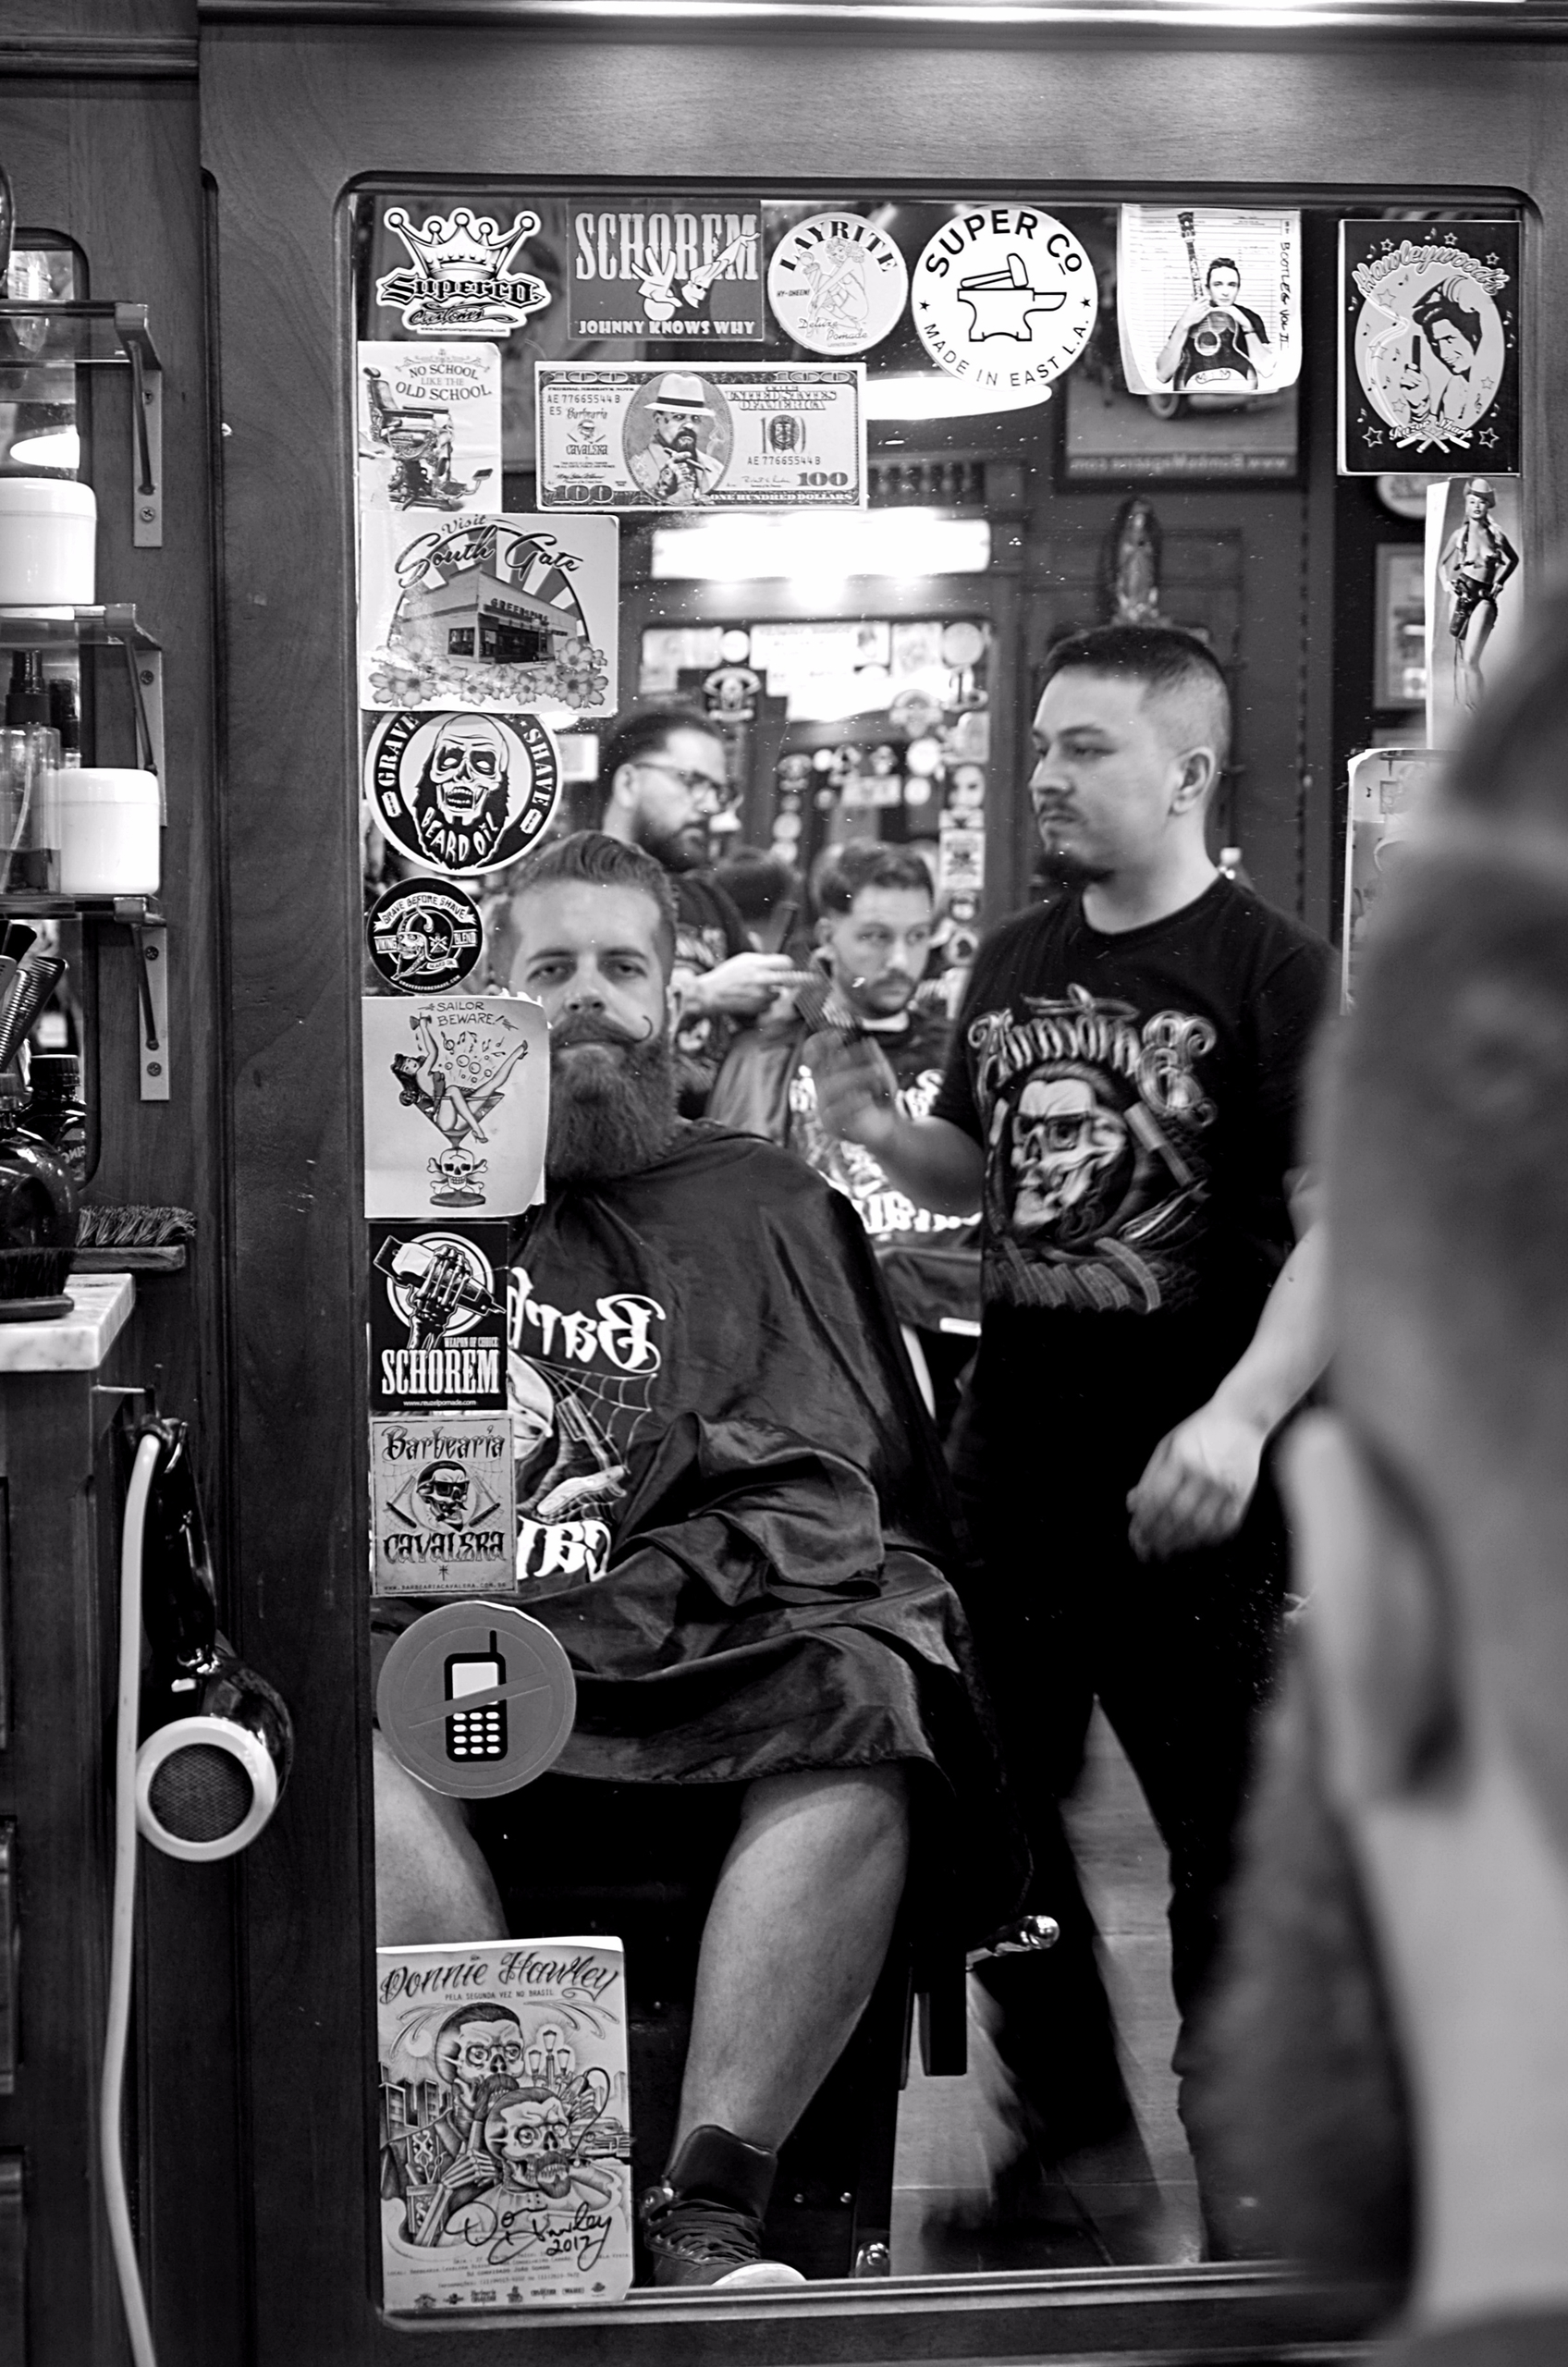 barber Job photographic Content - olliveirageane | ello